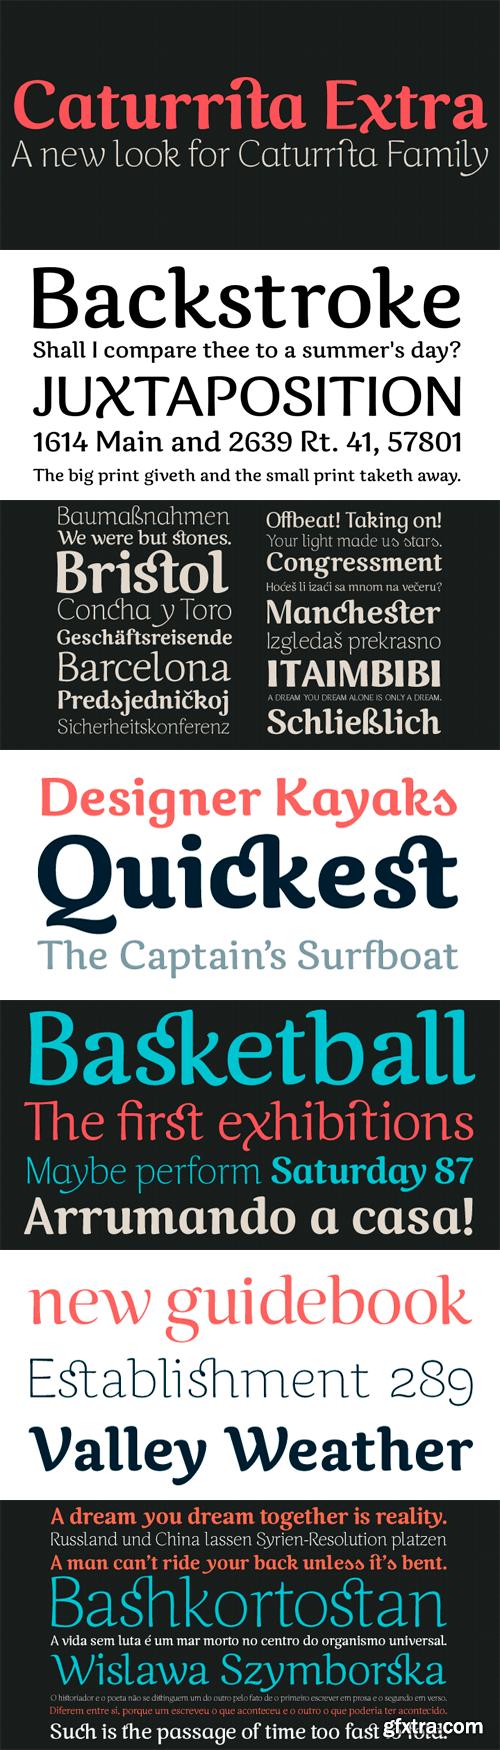 Caturrita Font Family - 5 Fonts for $40